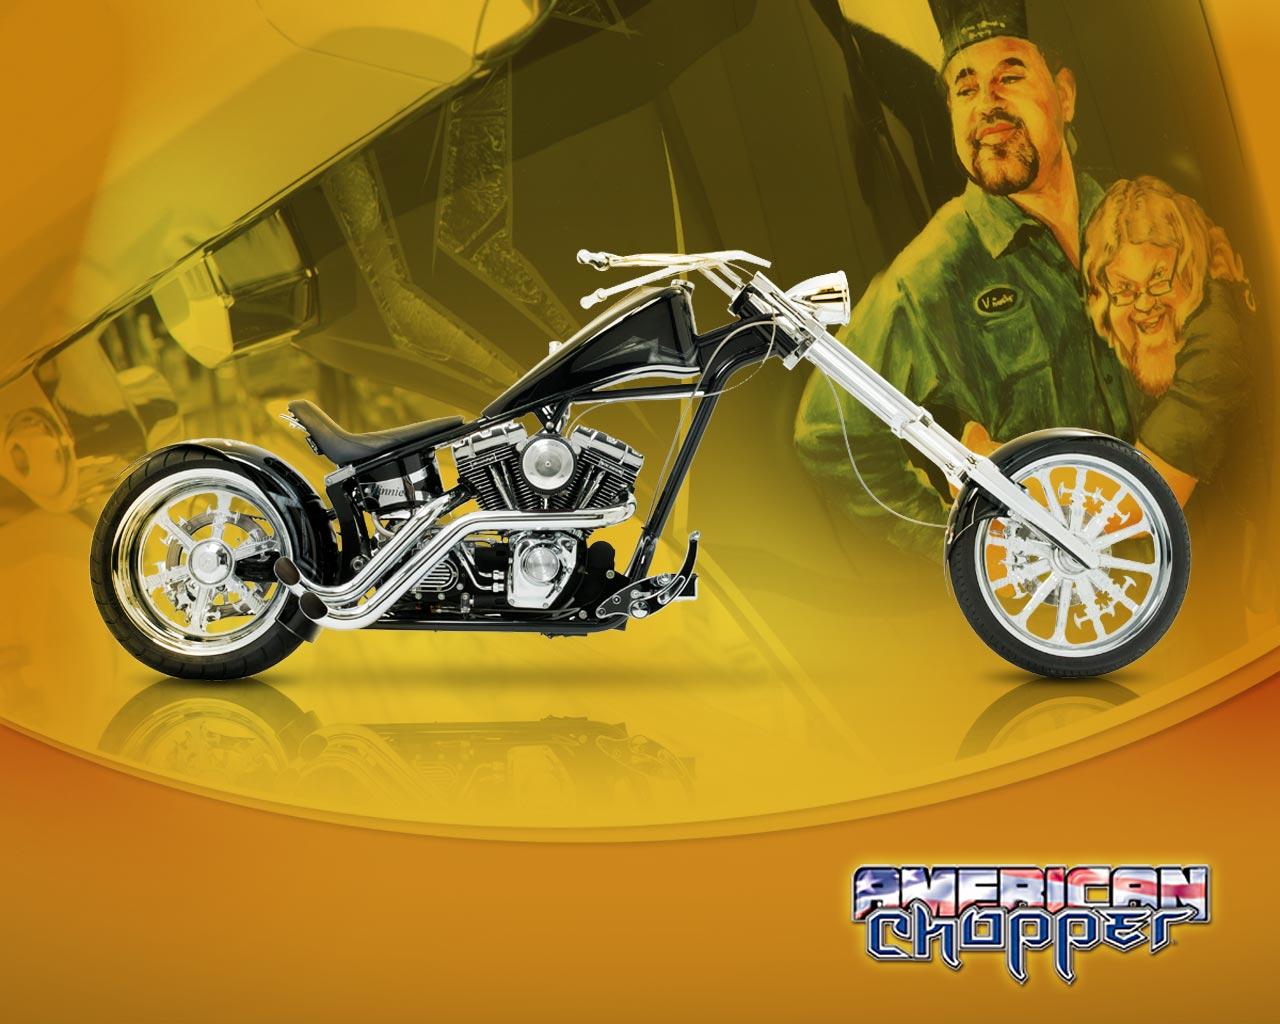 American chopper   Orange County Choppers Wallpaper 124420 1280x1024